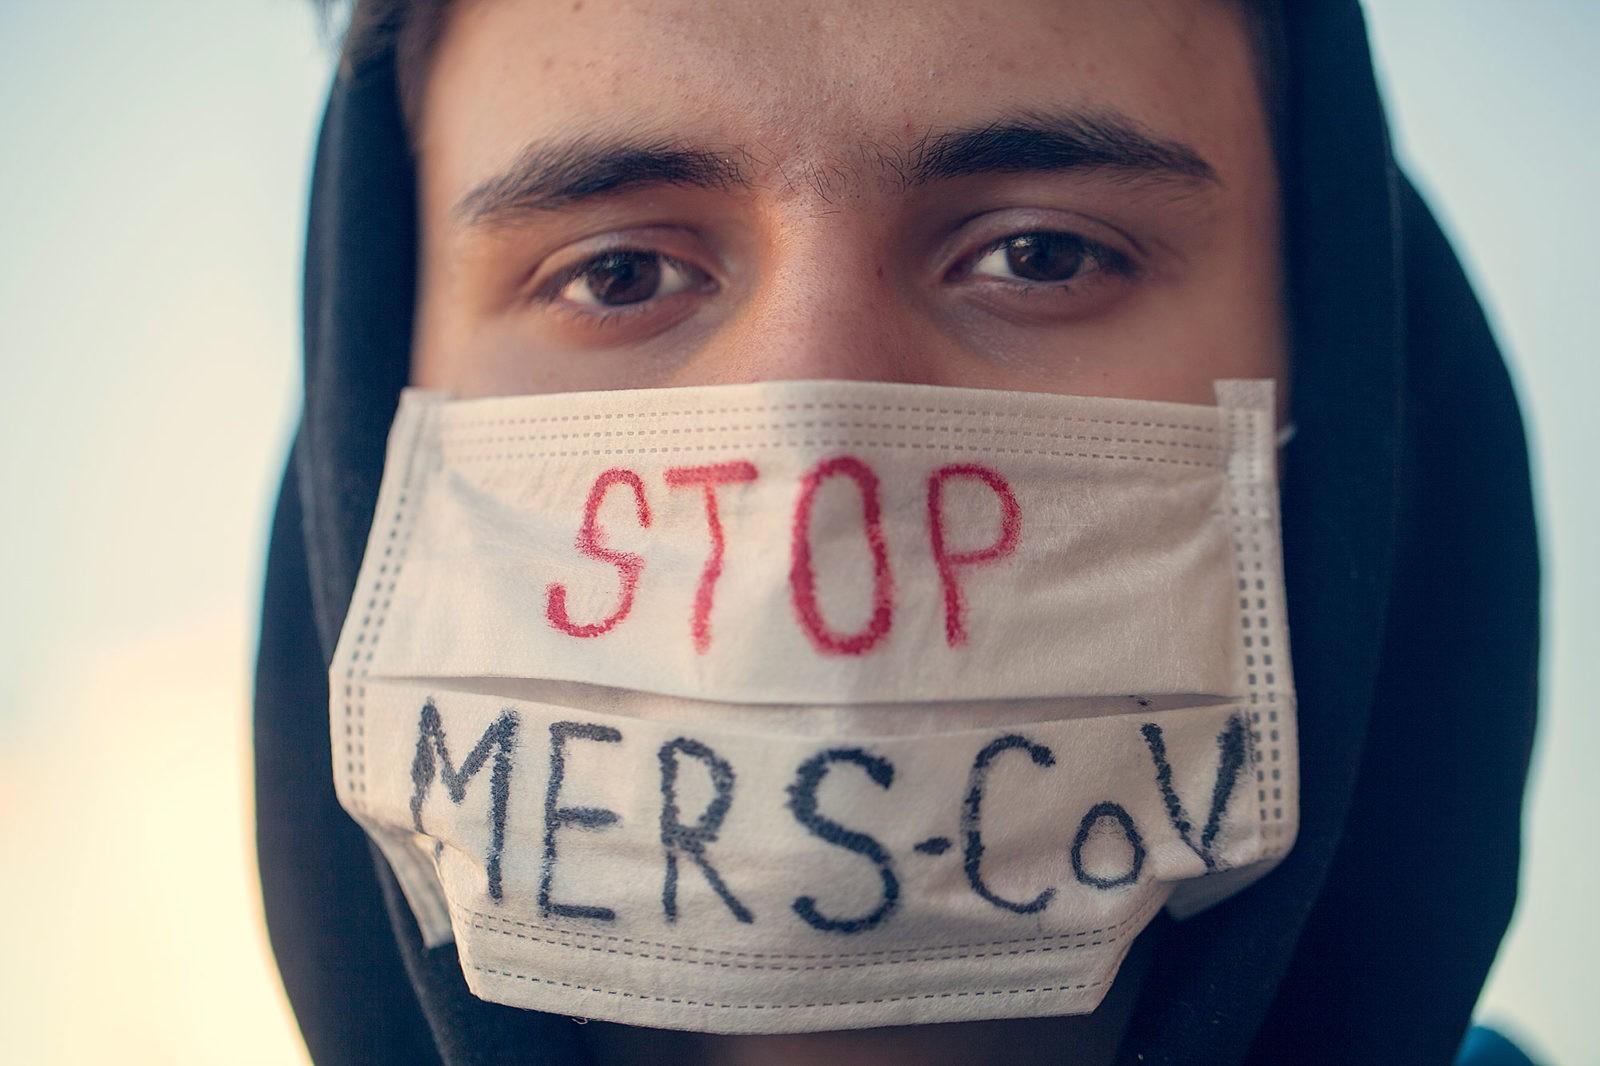 Mers-Cov (коронавирус ближневосточного респираторного синдрома)